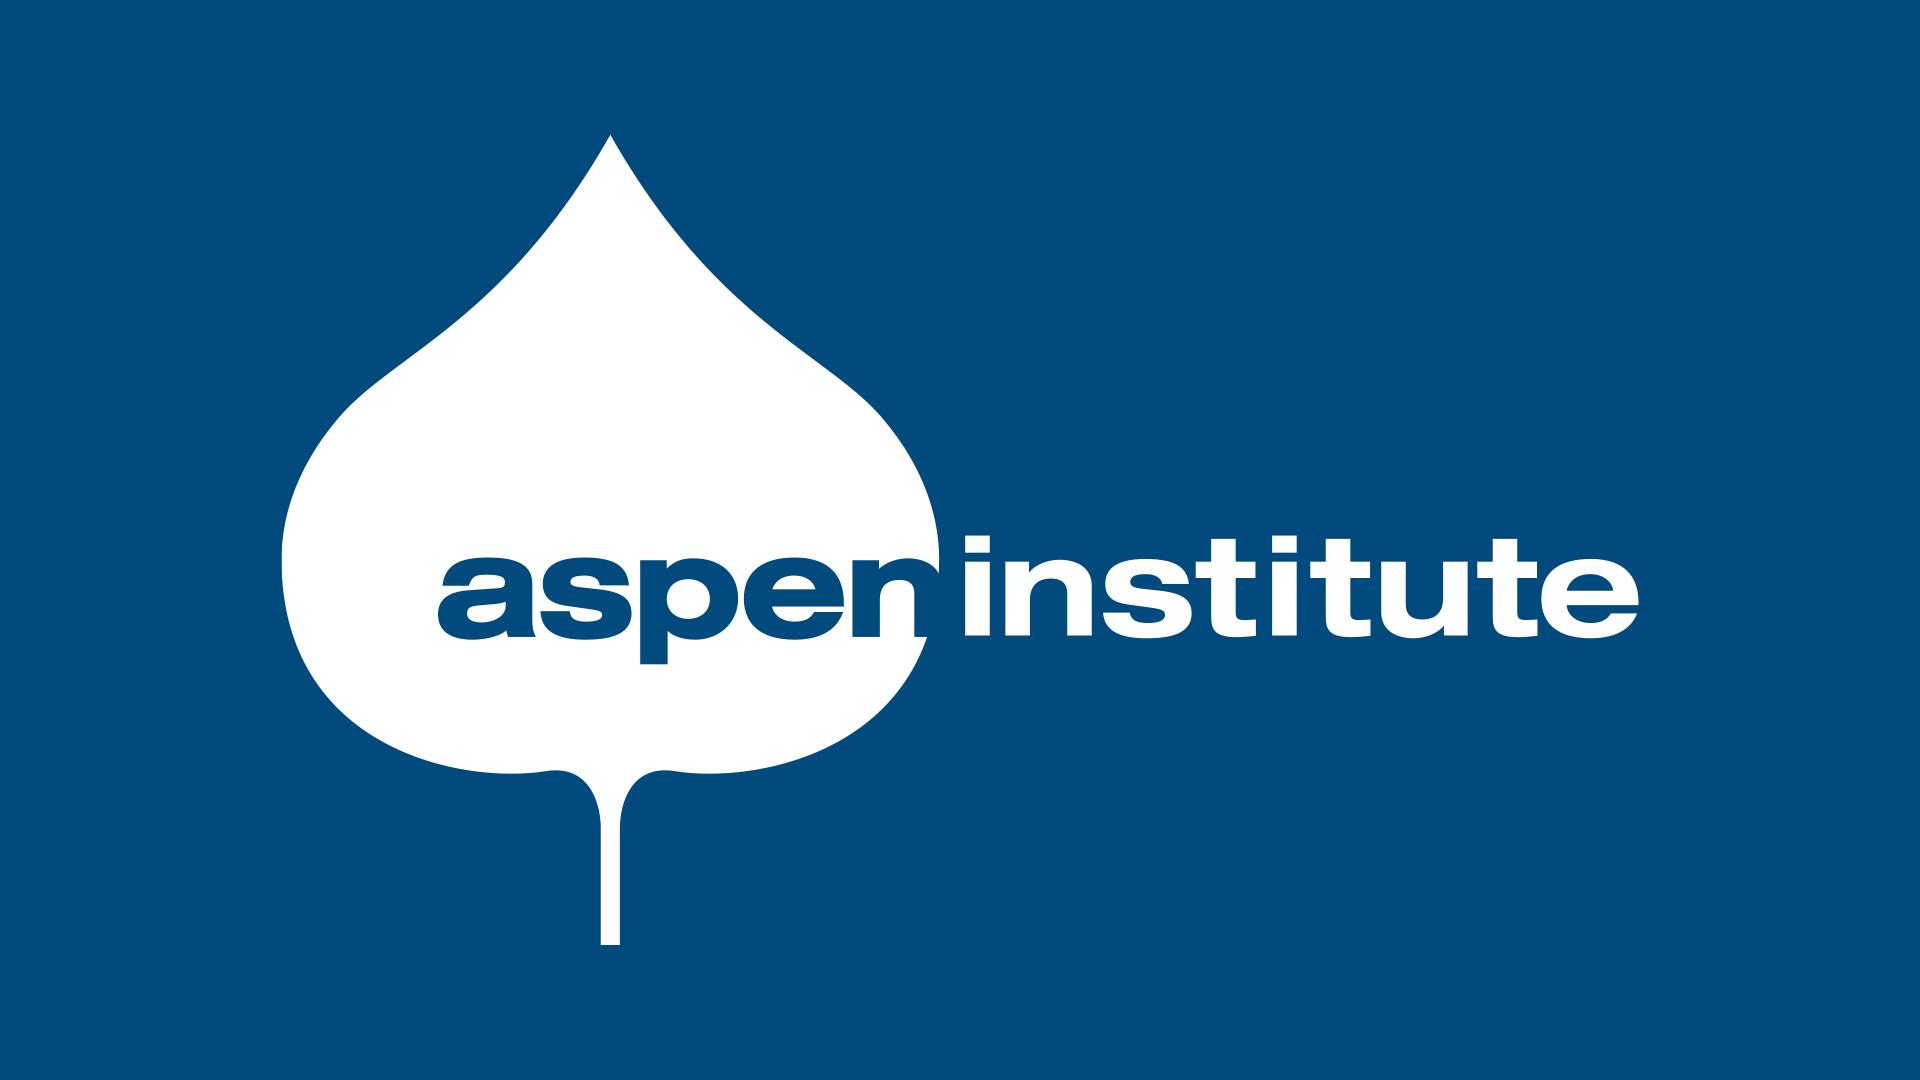 www.aspeninstitute.org